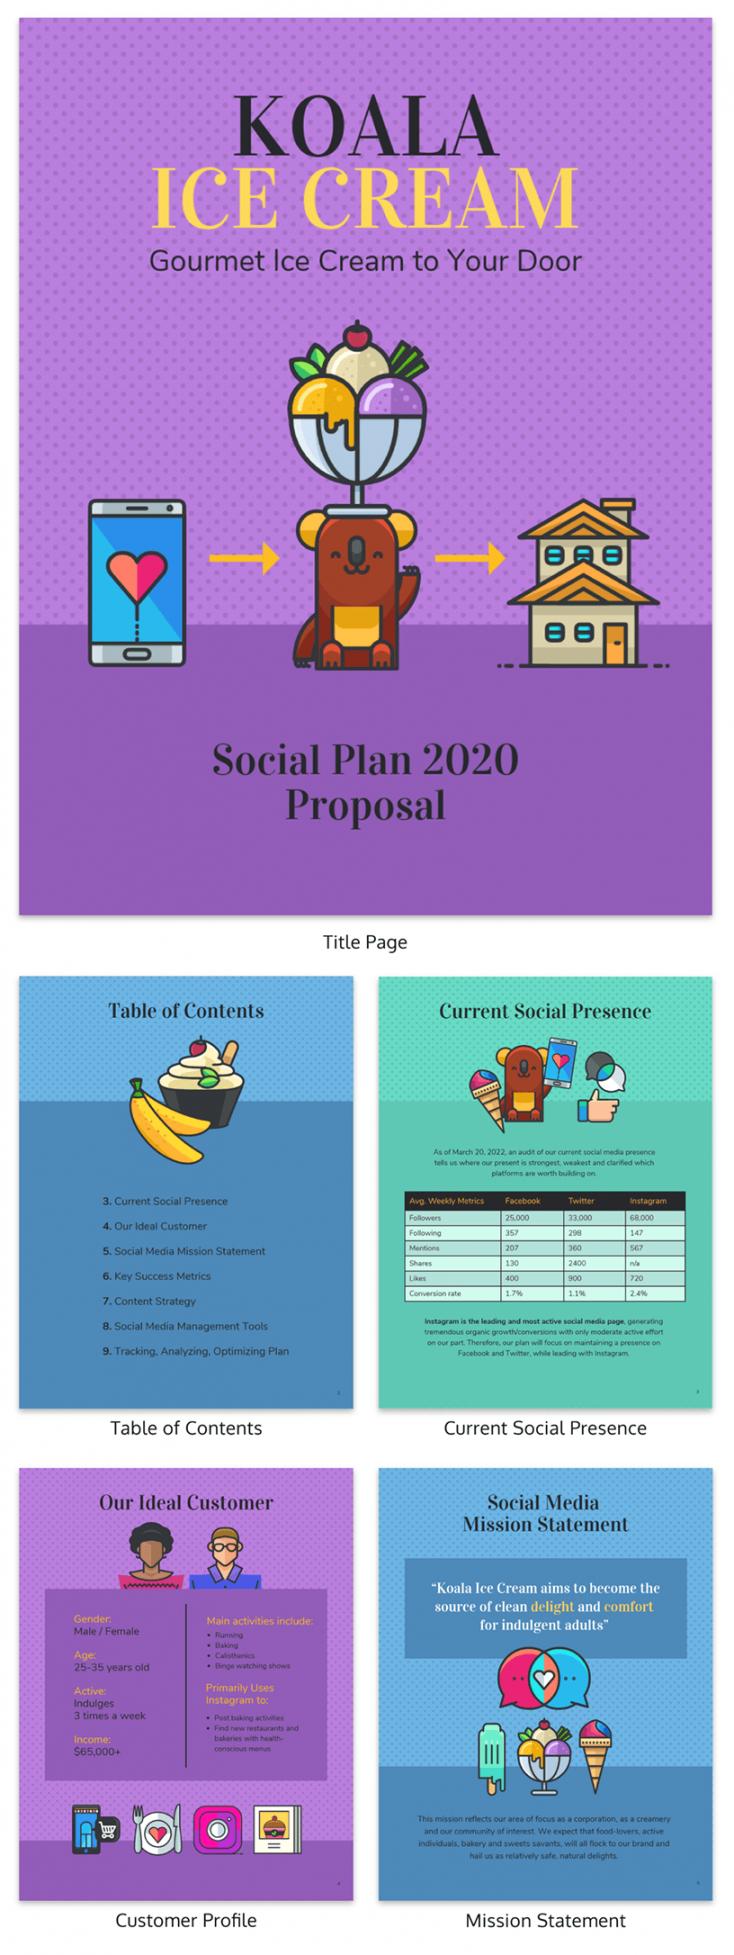 sample social media plan proposal template social media management proposal template excel